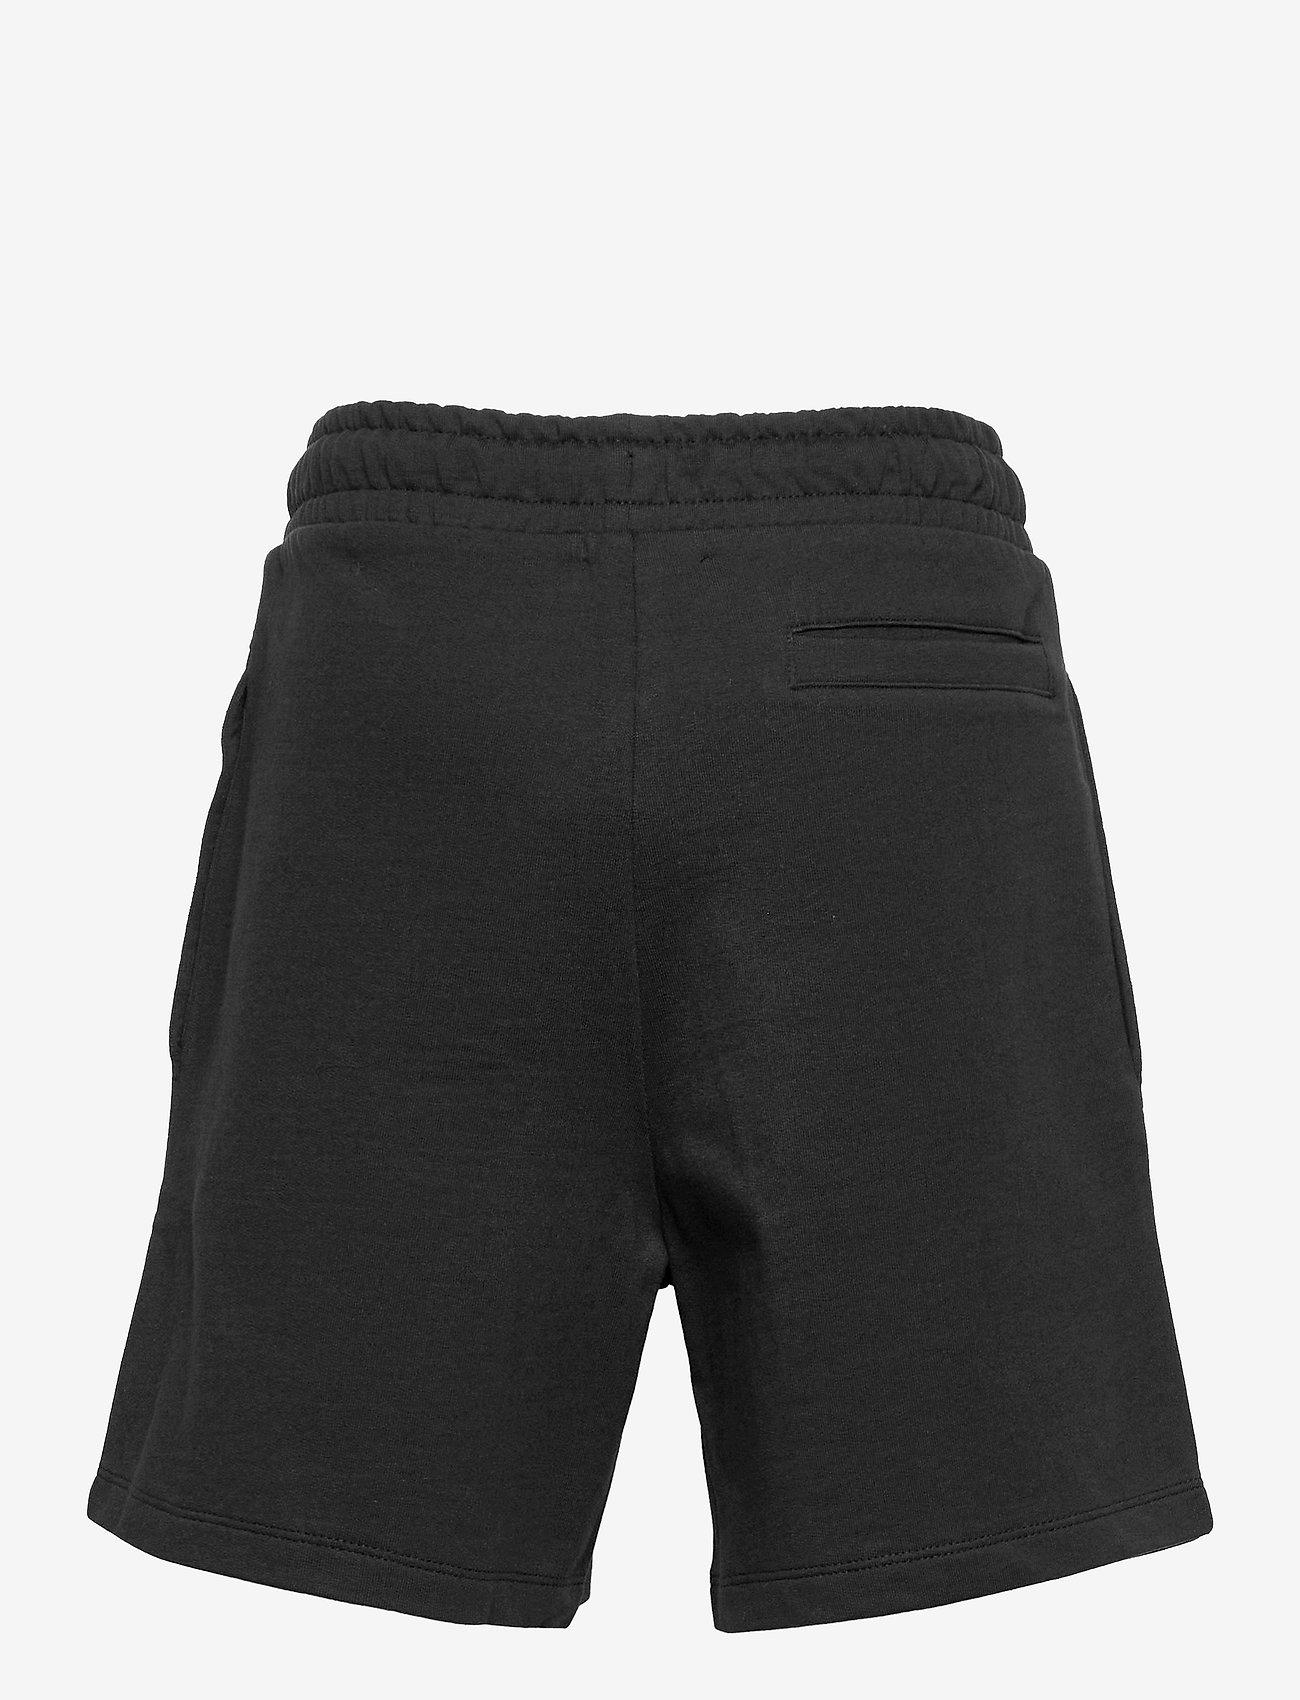 LMTD - NLMHERMO SWEAT SHORTS - shorts - black - 1